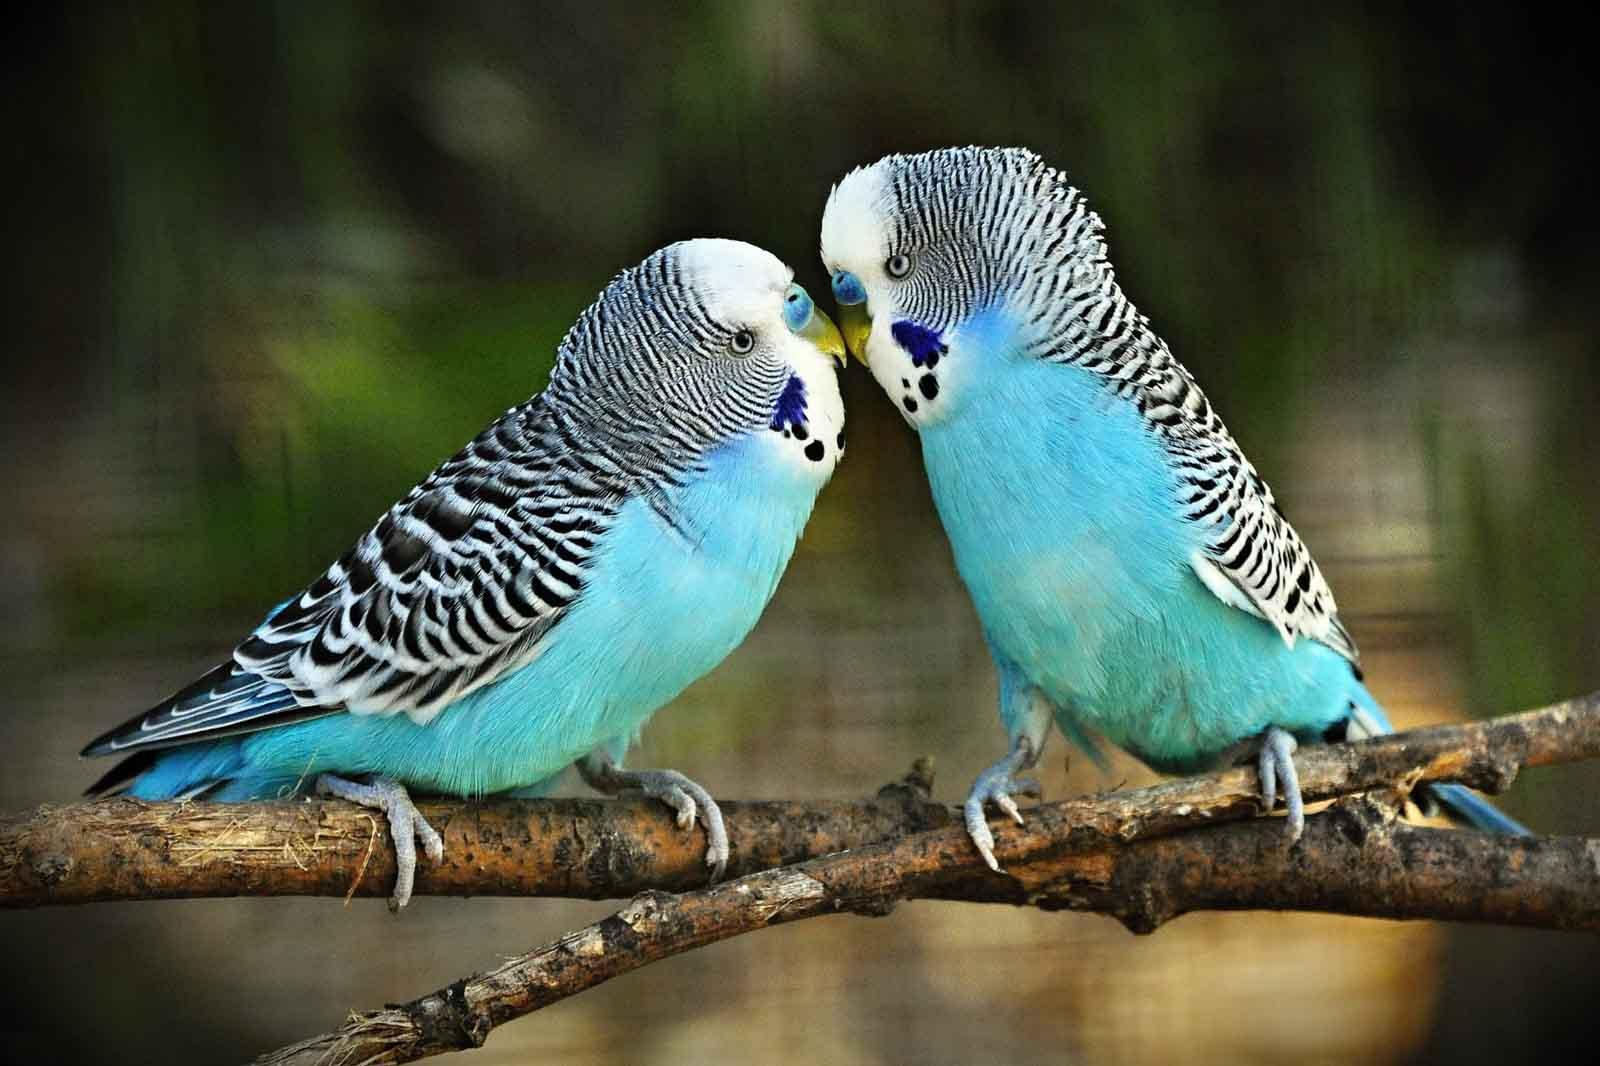 Cute budgerigar birds images